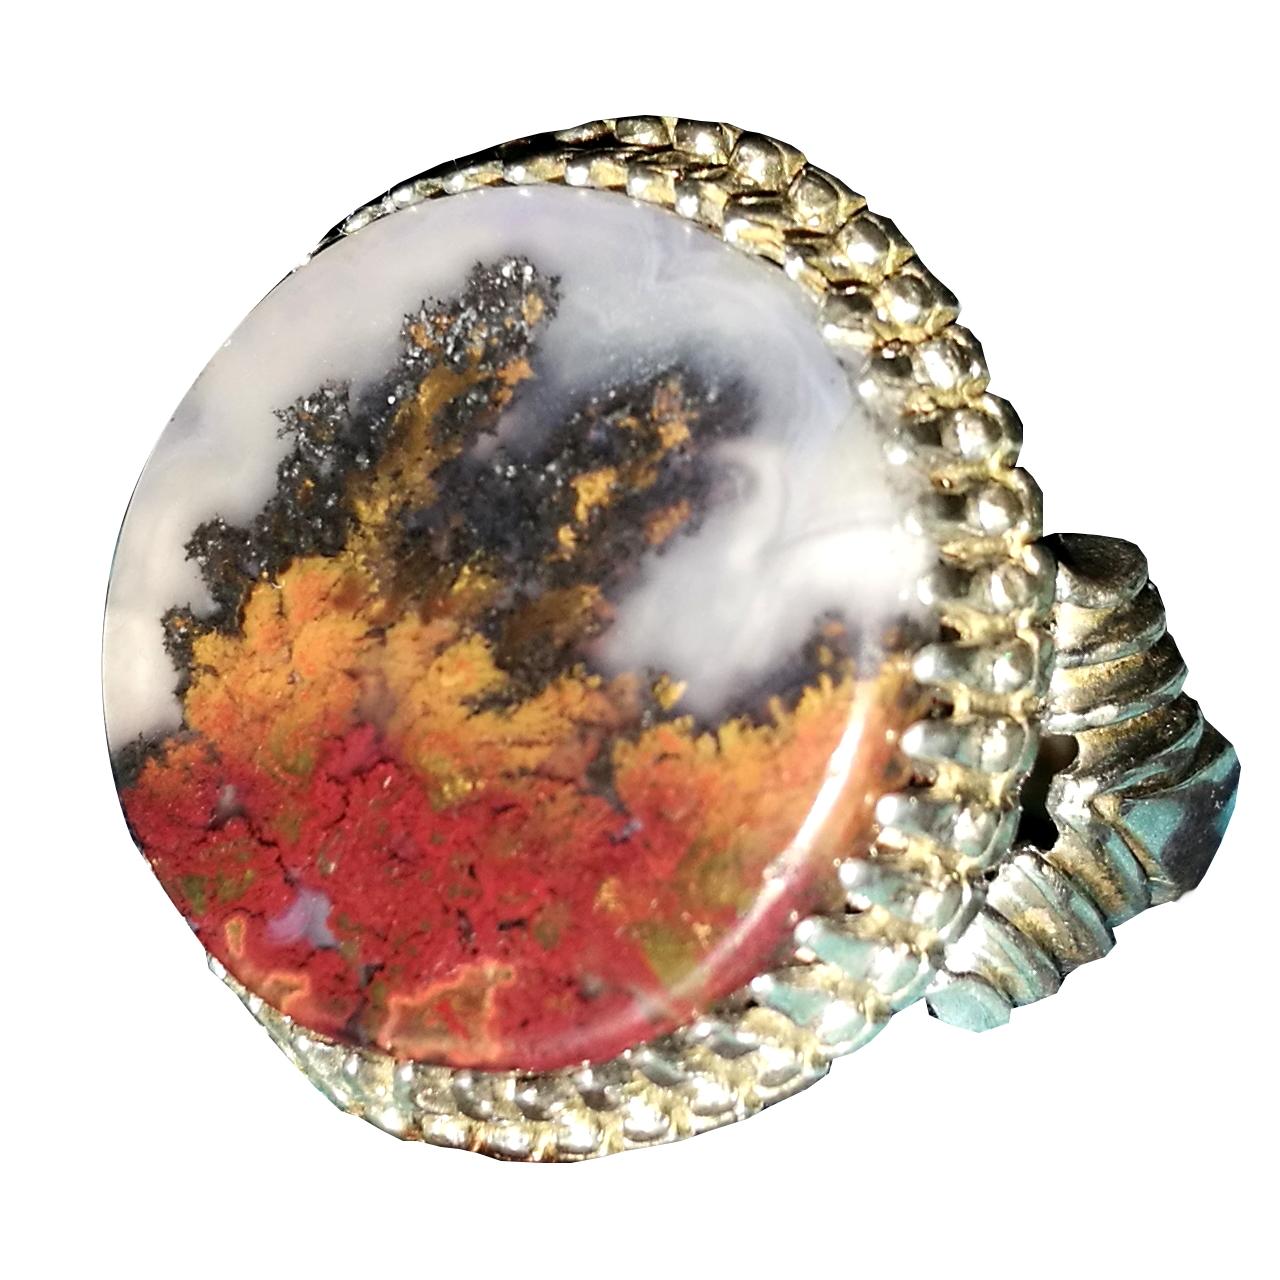 انگشتر نقره مردانه عقیق شجر کد 360 |